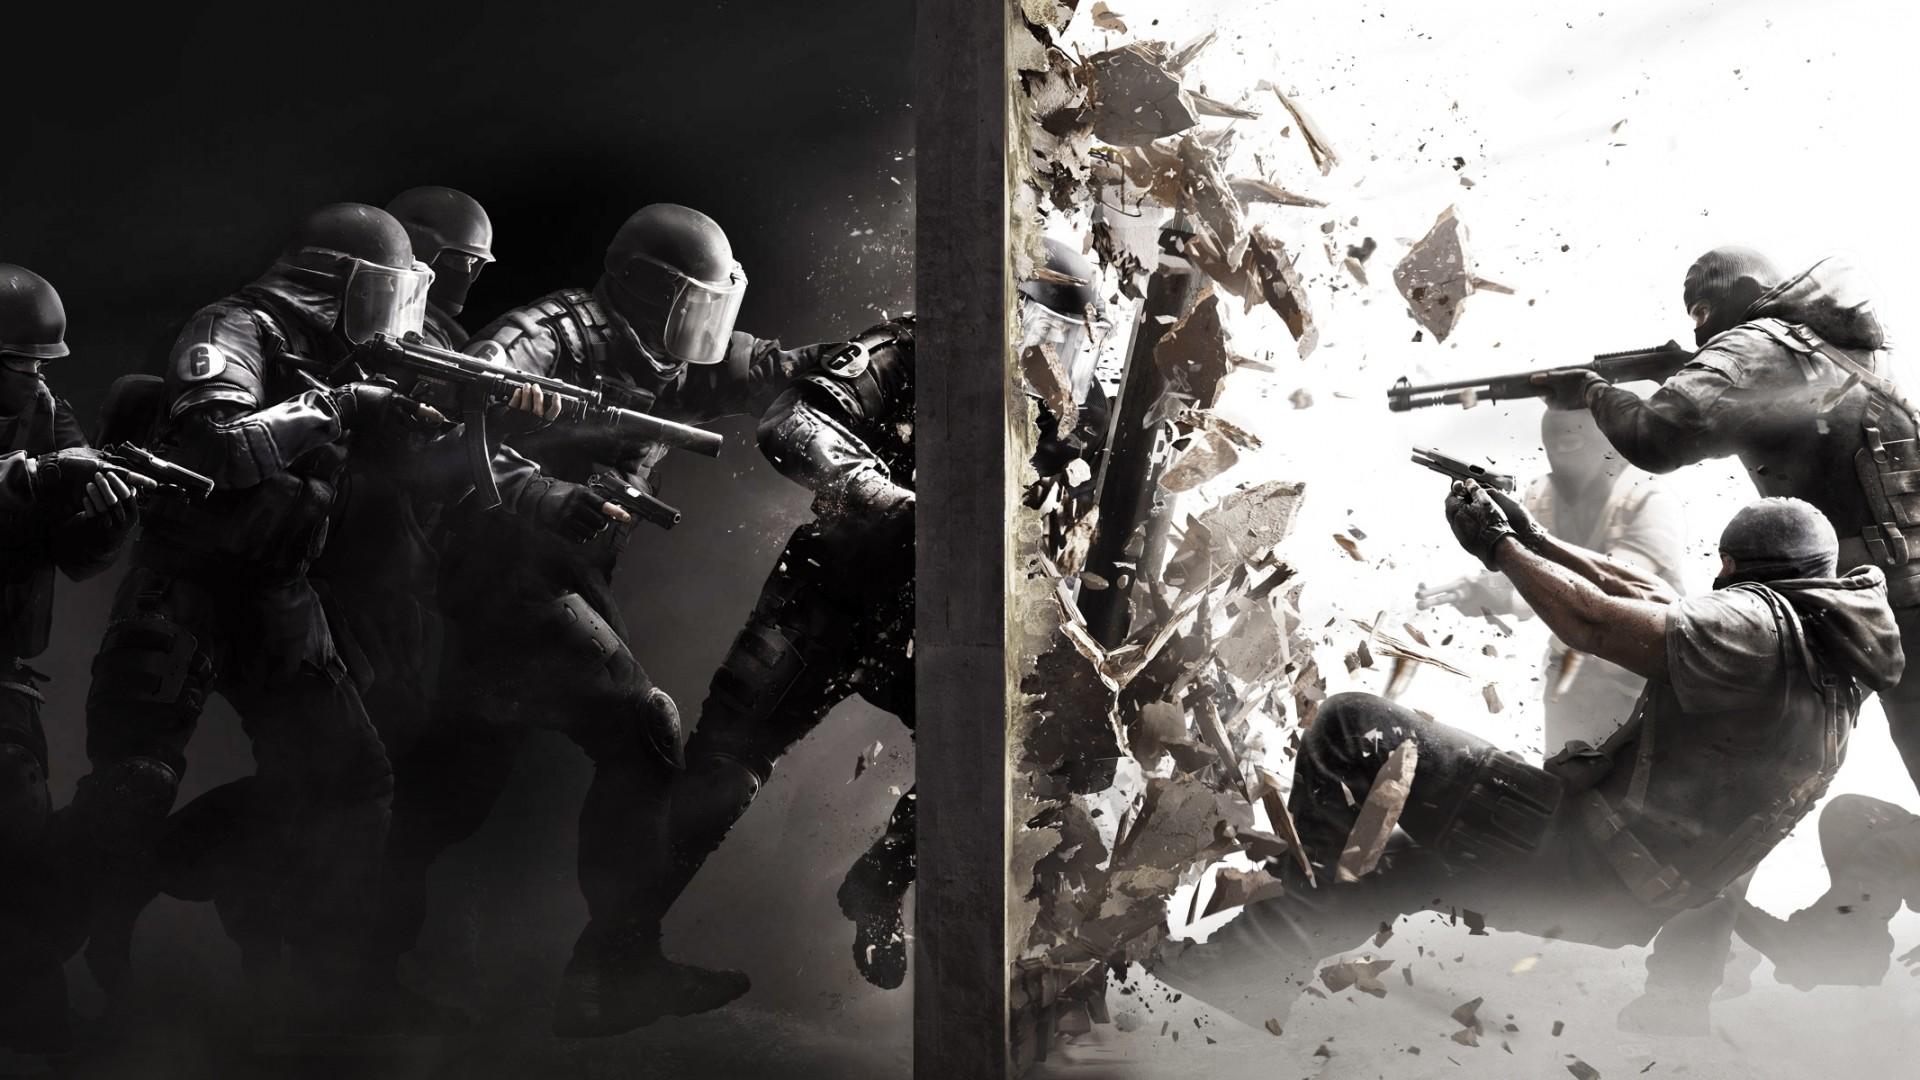 With Other Teams Such As Swat, Sas, Gsg 9, Spetsnaz - Rainbow Six Siege Wallpaper Windows - HD Wallpaper